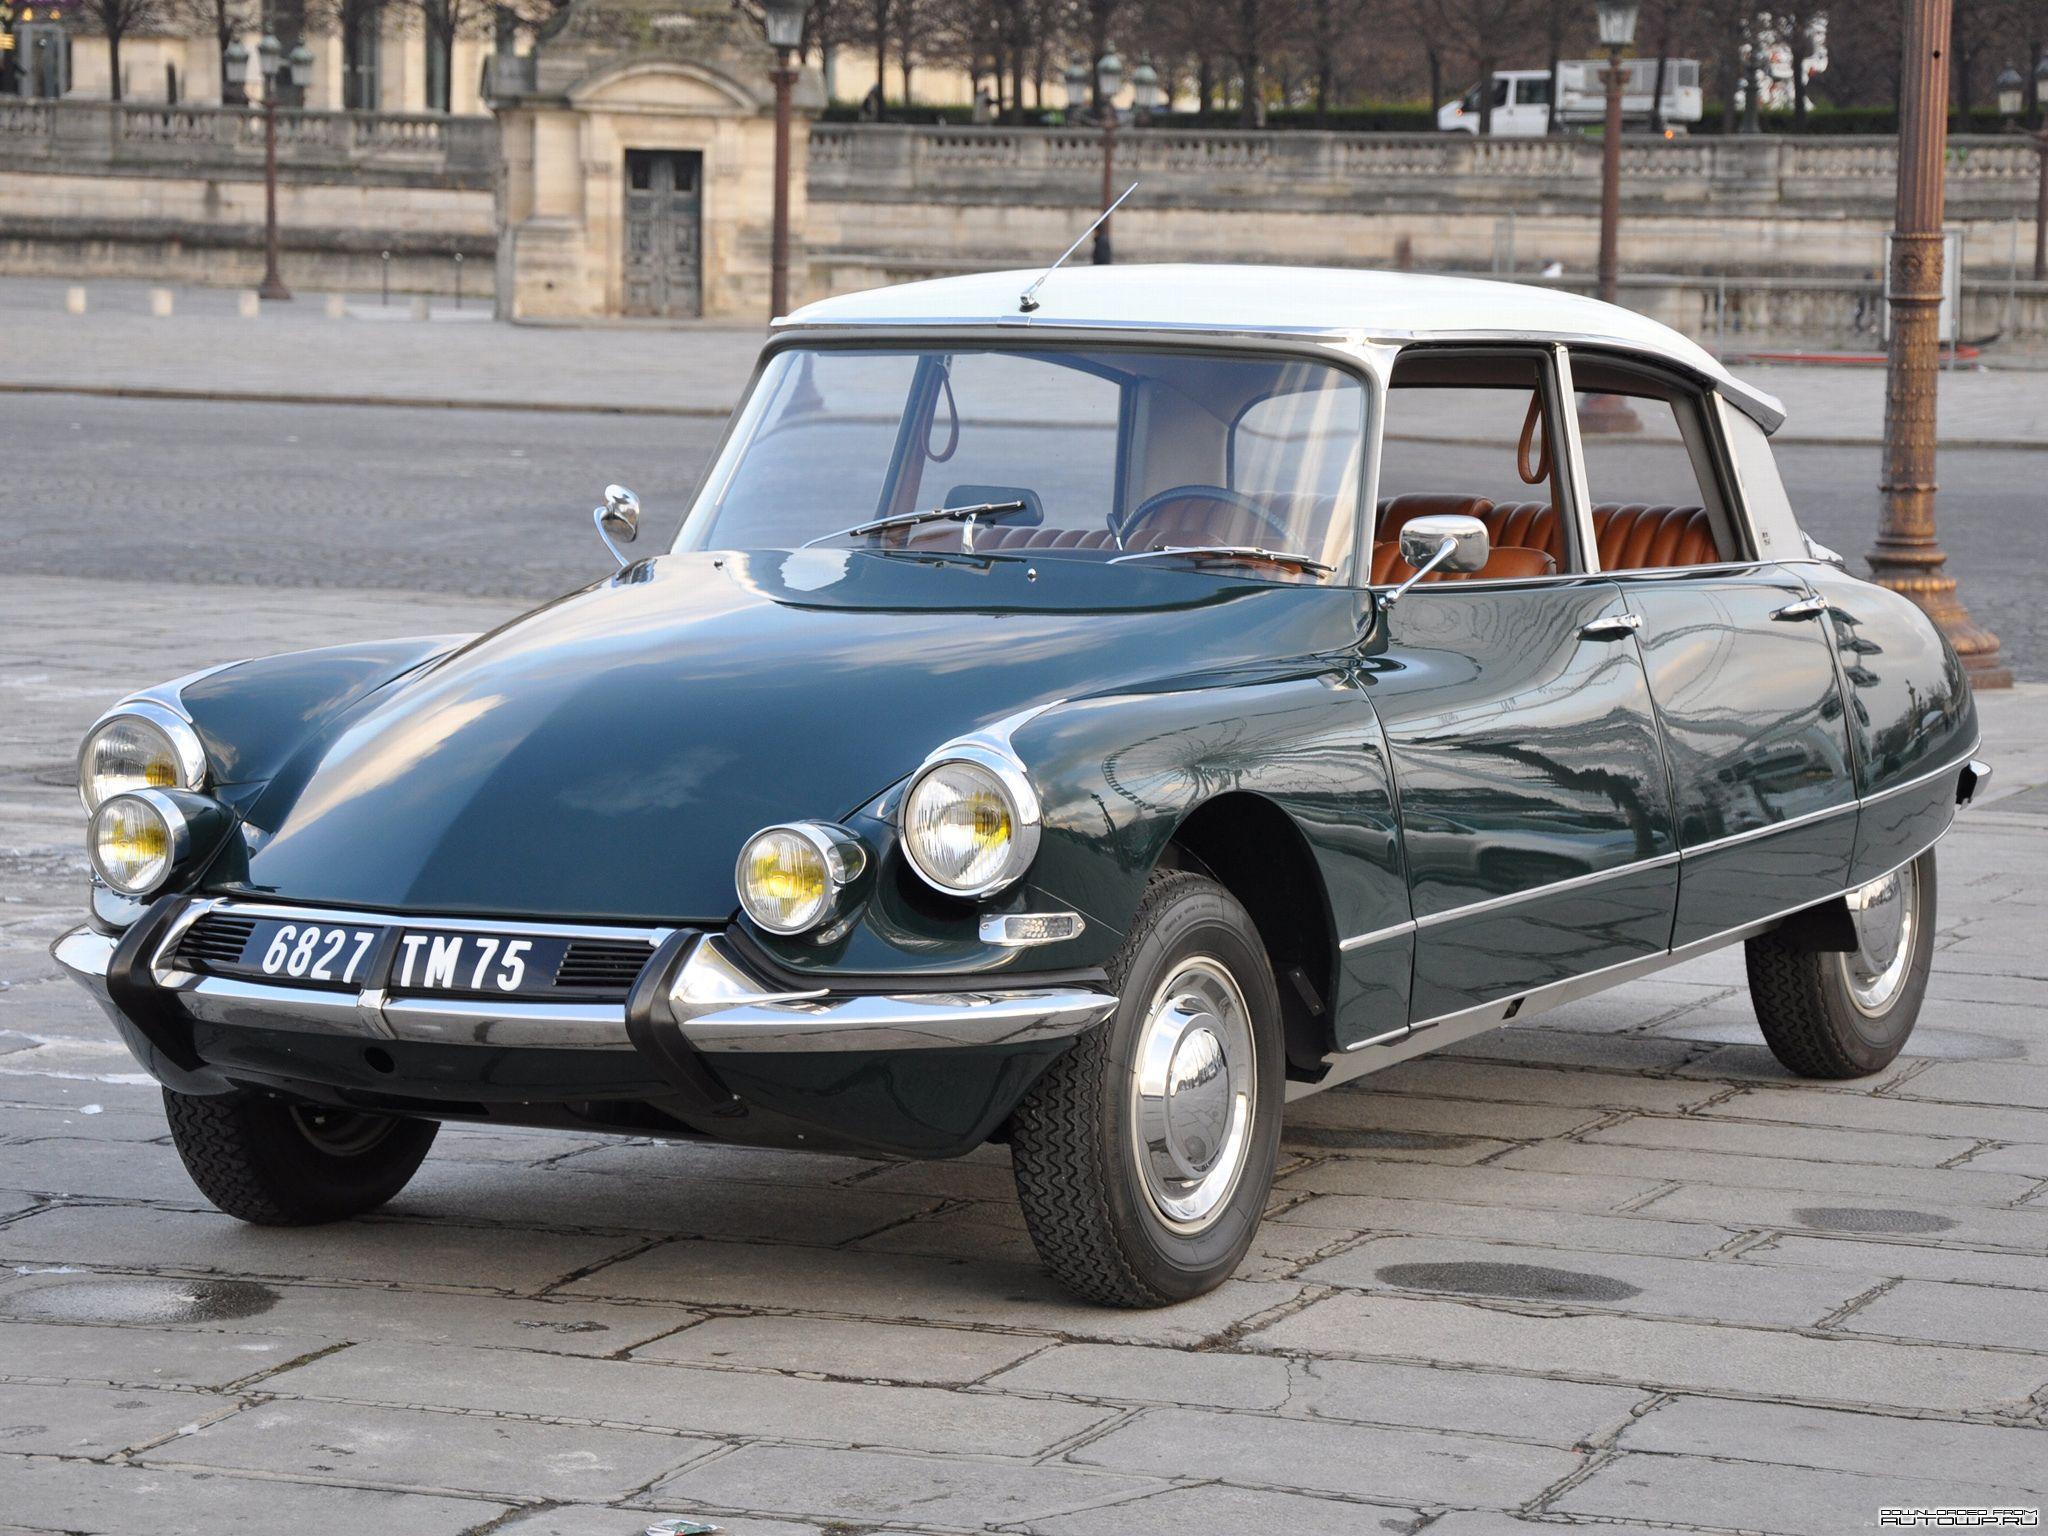 Citroen : DS 21 Pallas - Dad car | beautiful Citroen DS <3 ...